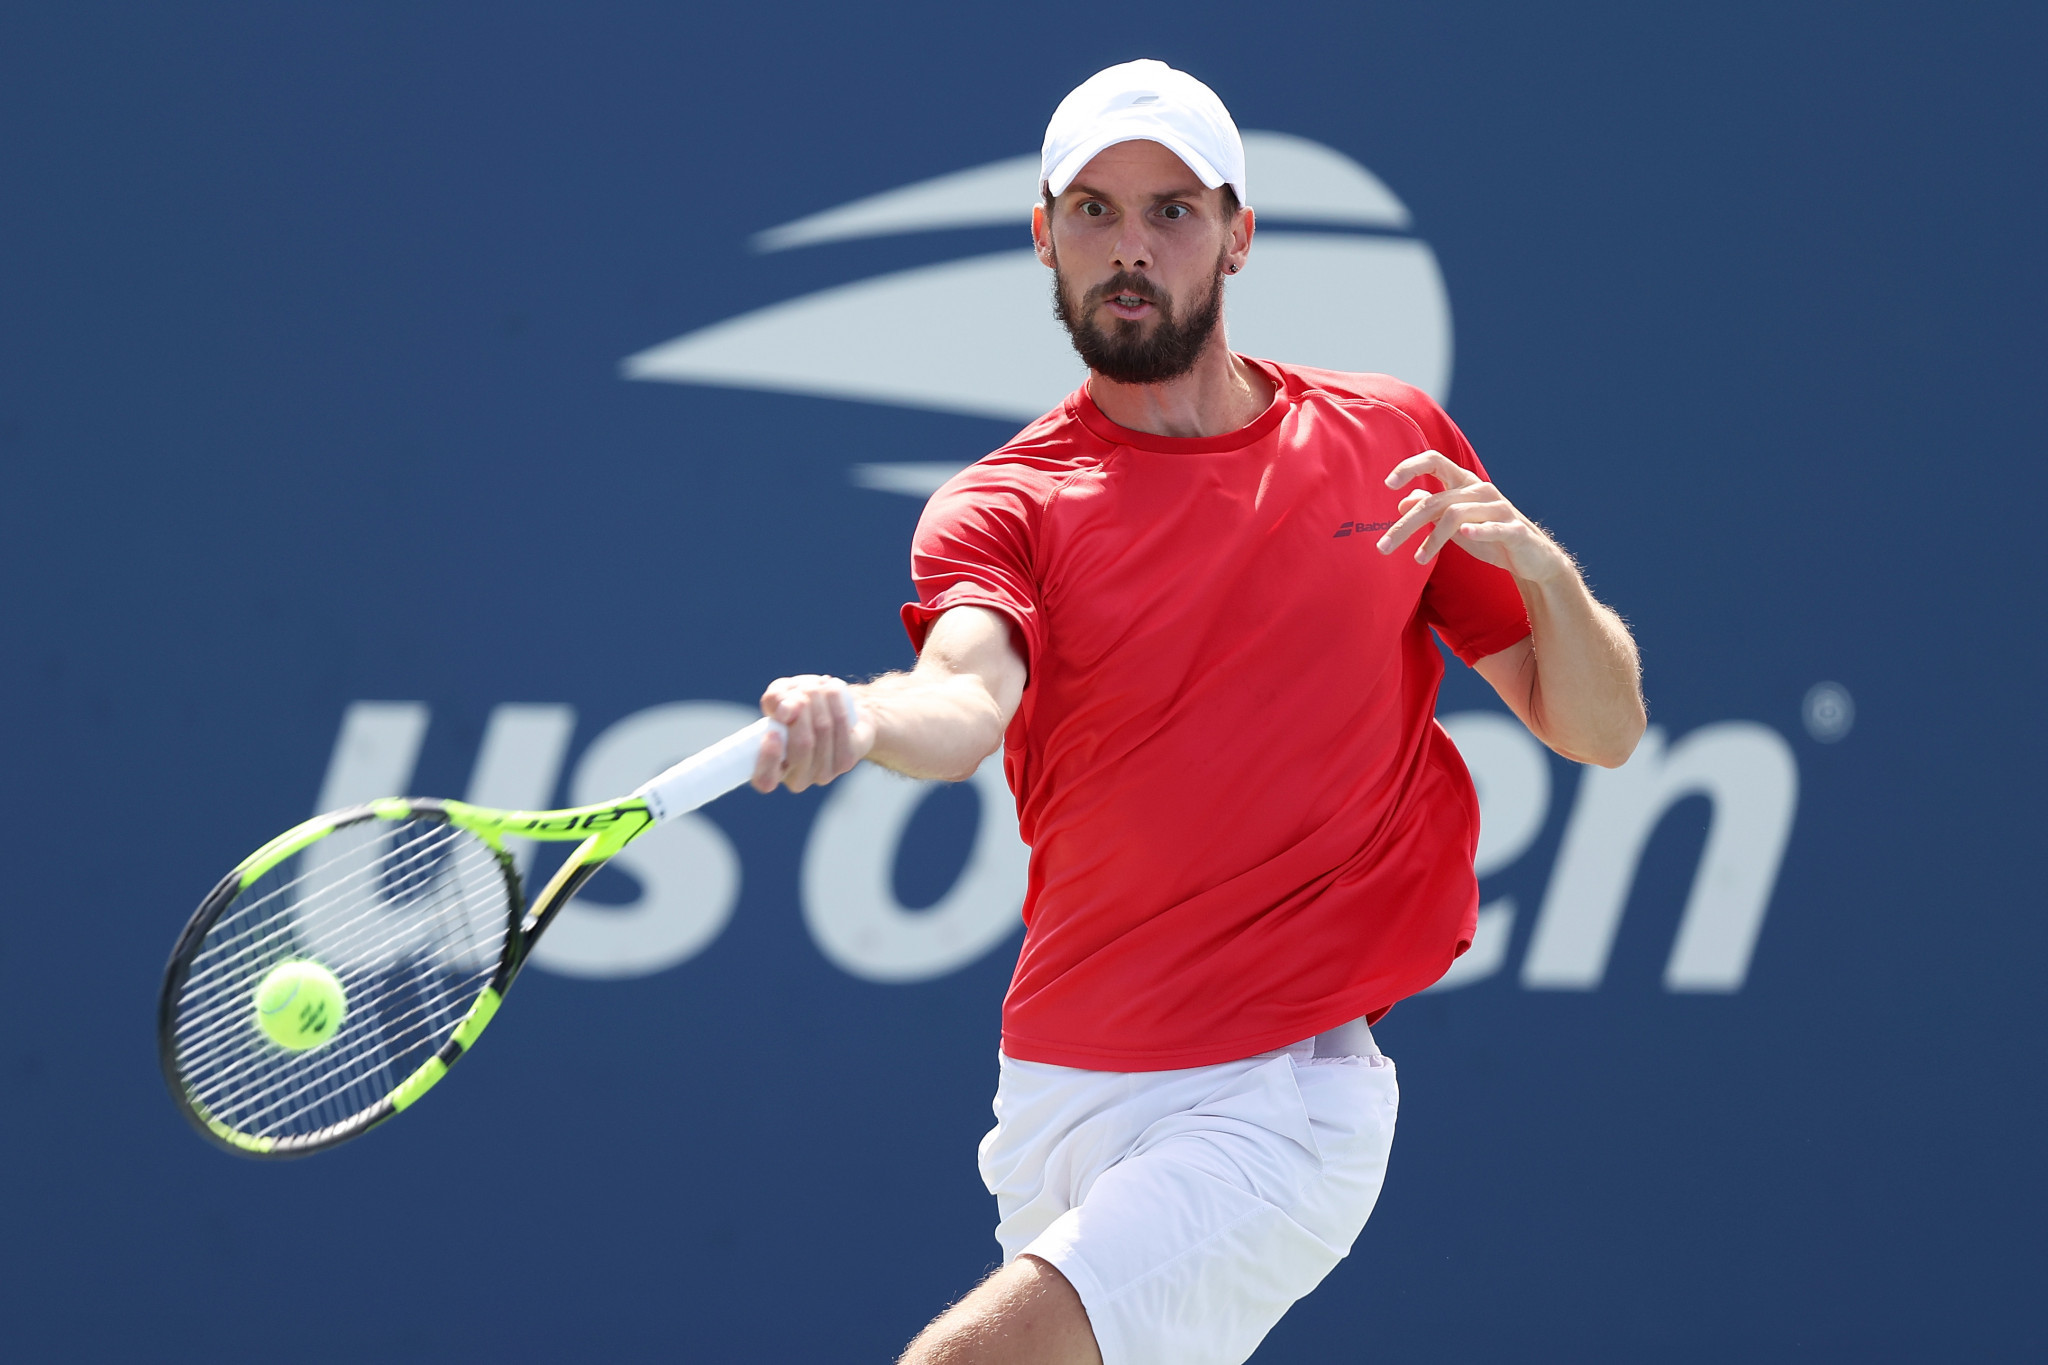 Qualifiers Otte and Raducanu reach US Open fourth round